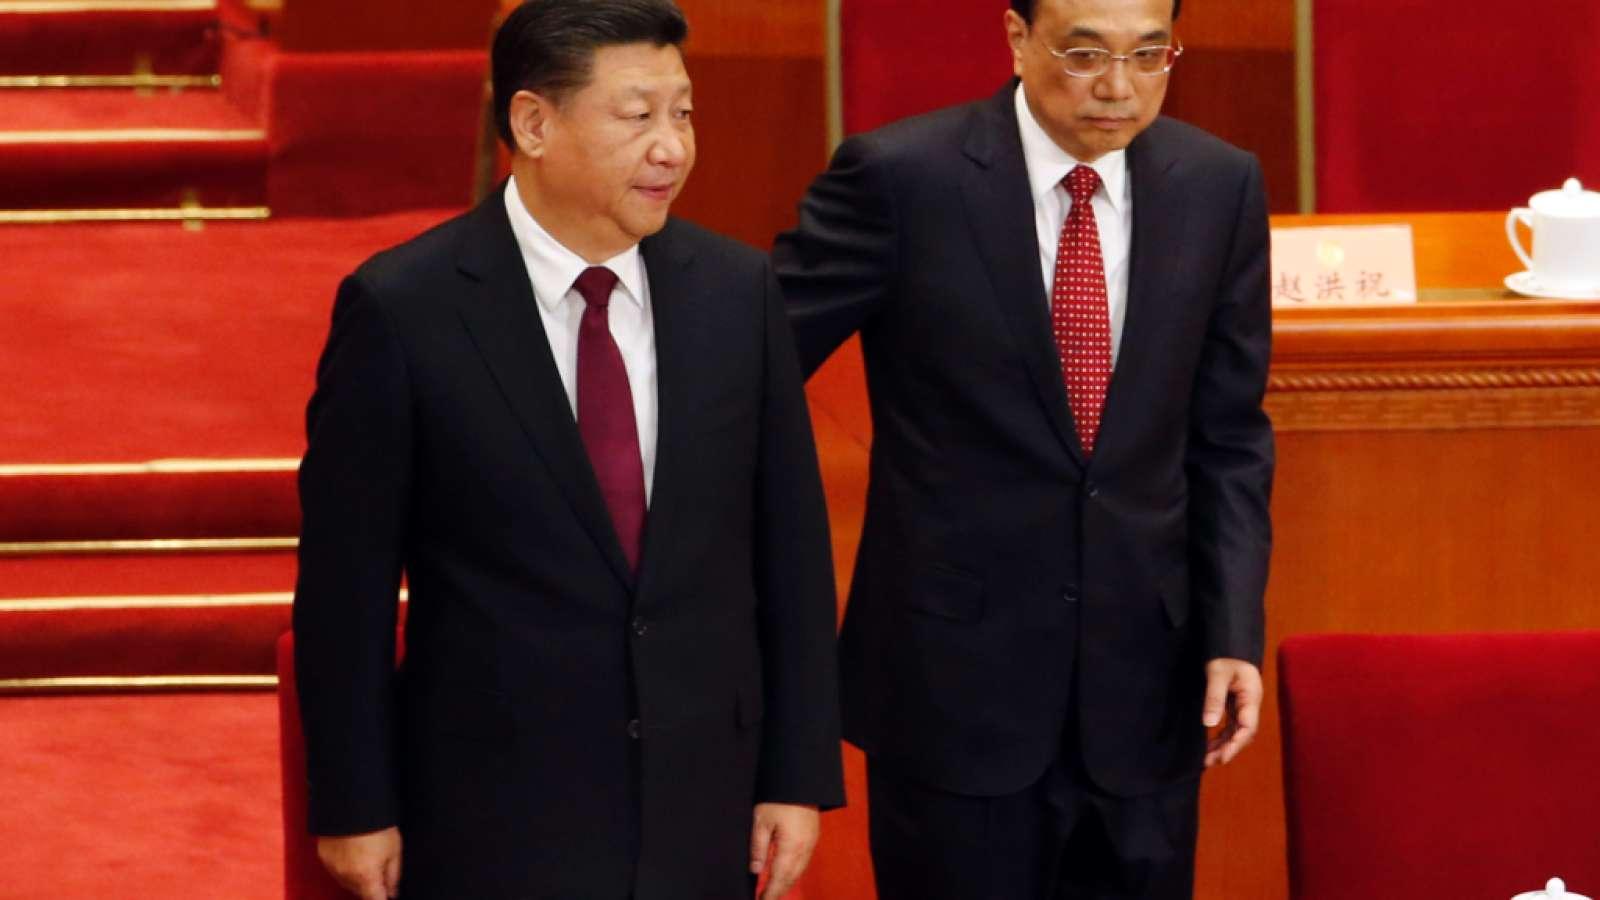 Kampf der Staatsverschuldung: Chinas Präsident Xi Jinping (links) und Premier Li Keqiang bei der Eröffnung des jährlichen Volkskongresses in Peking.